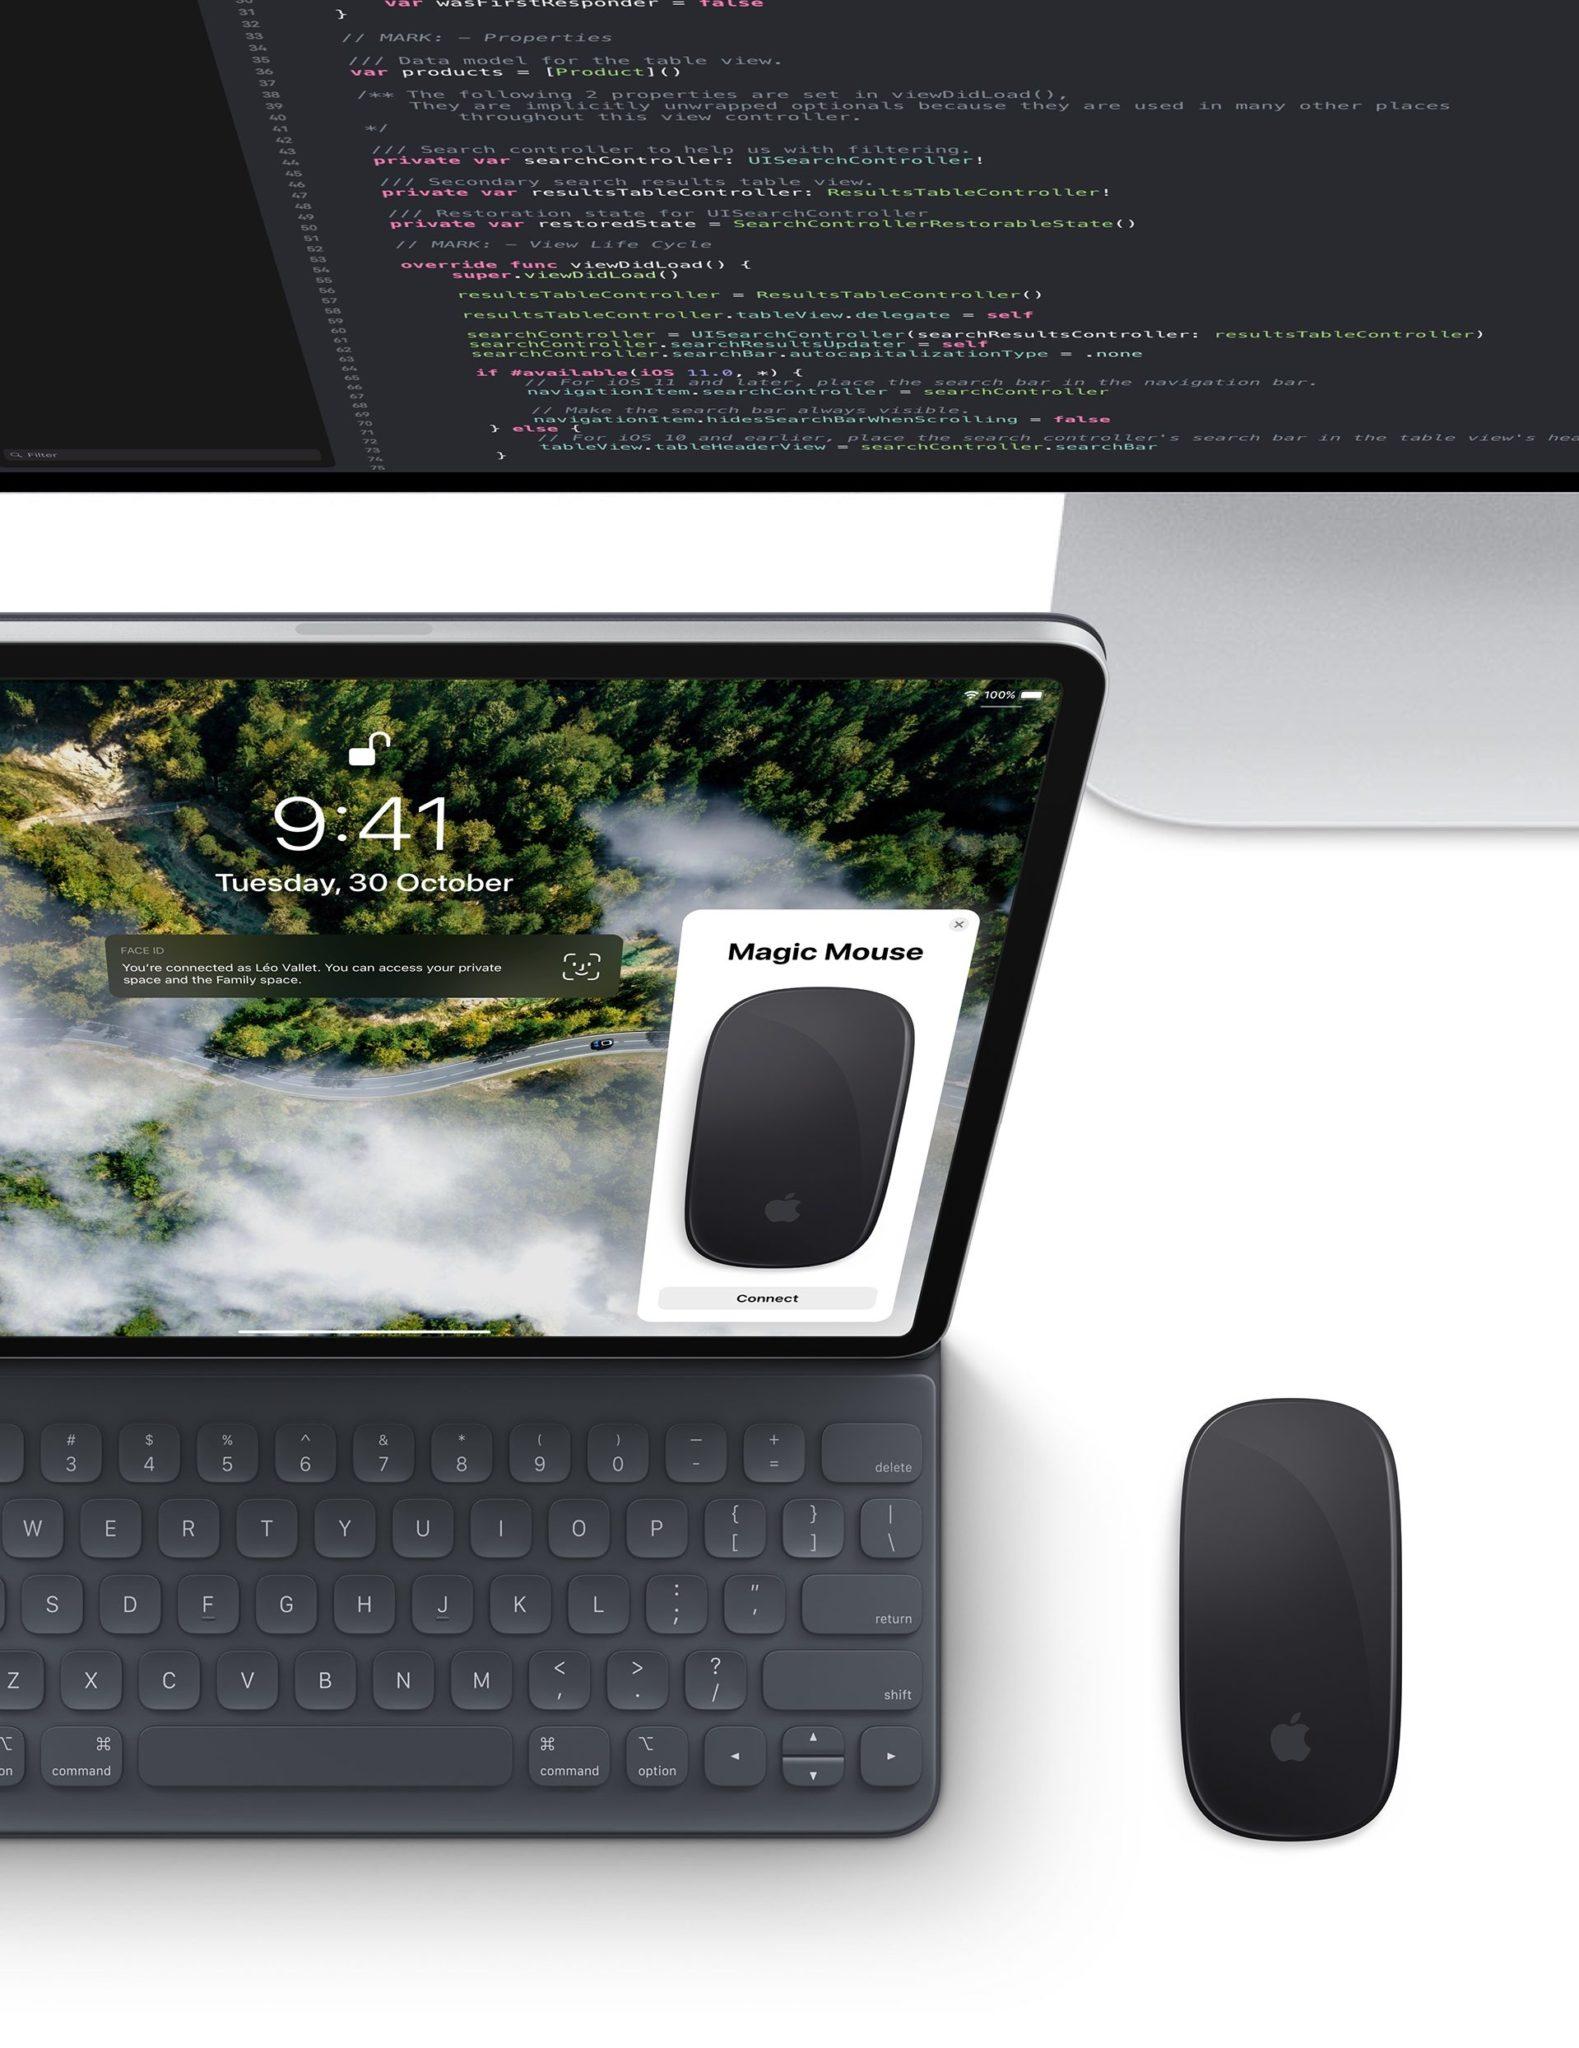 ios 13 concept leo vallet3 e1551898604768 - iOS 13: krásny koncept ukazuje, ako by mohla vyzerať podpora Magic Mouse na iPade